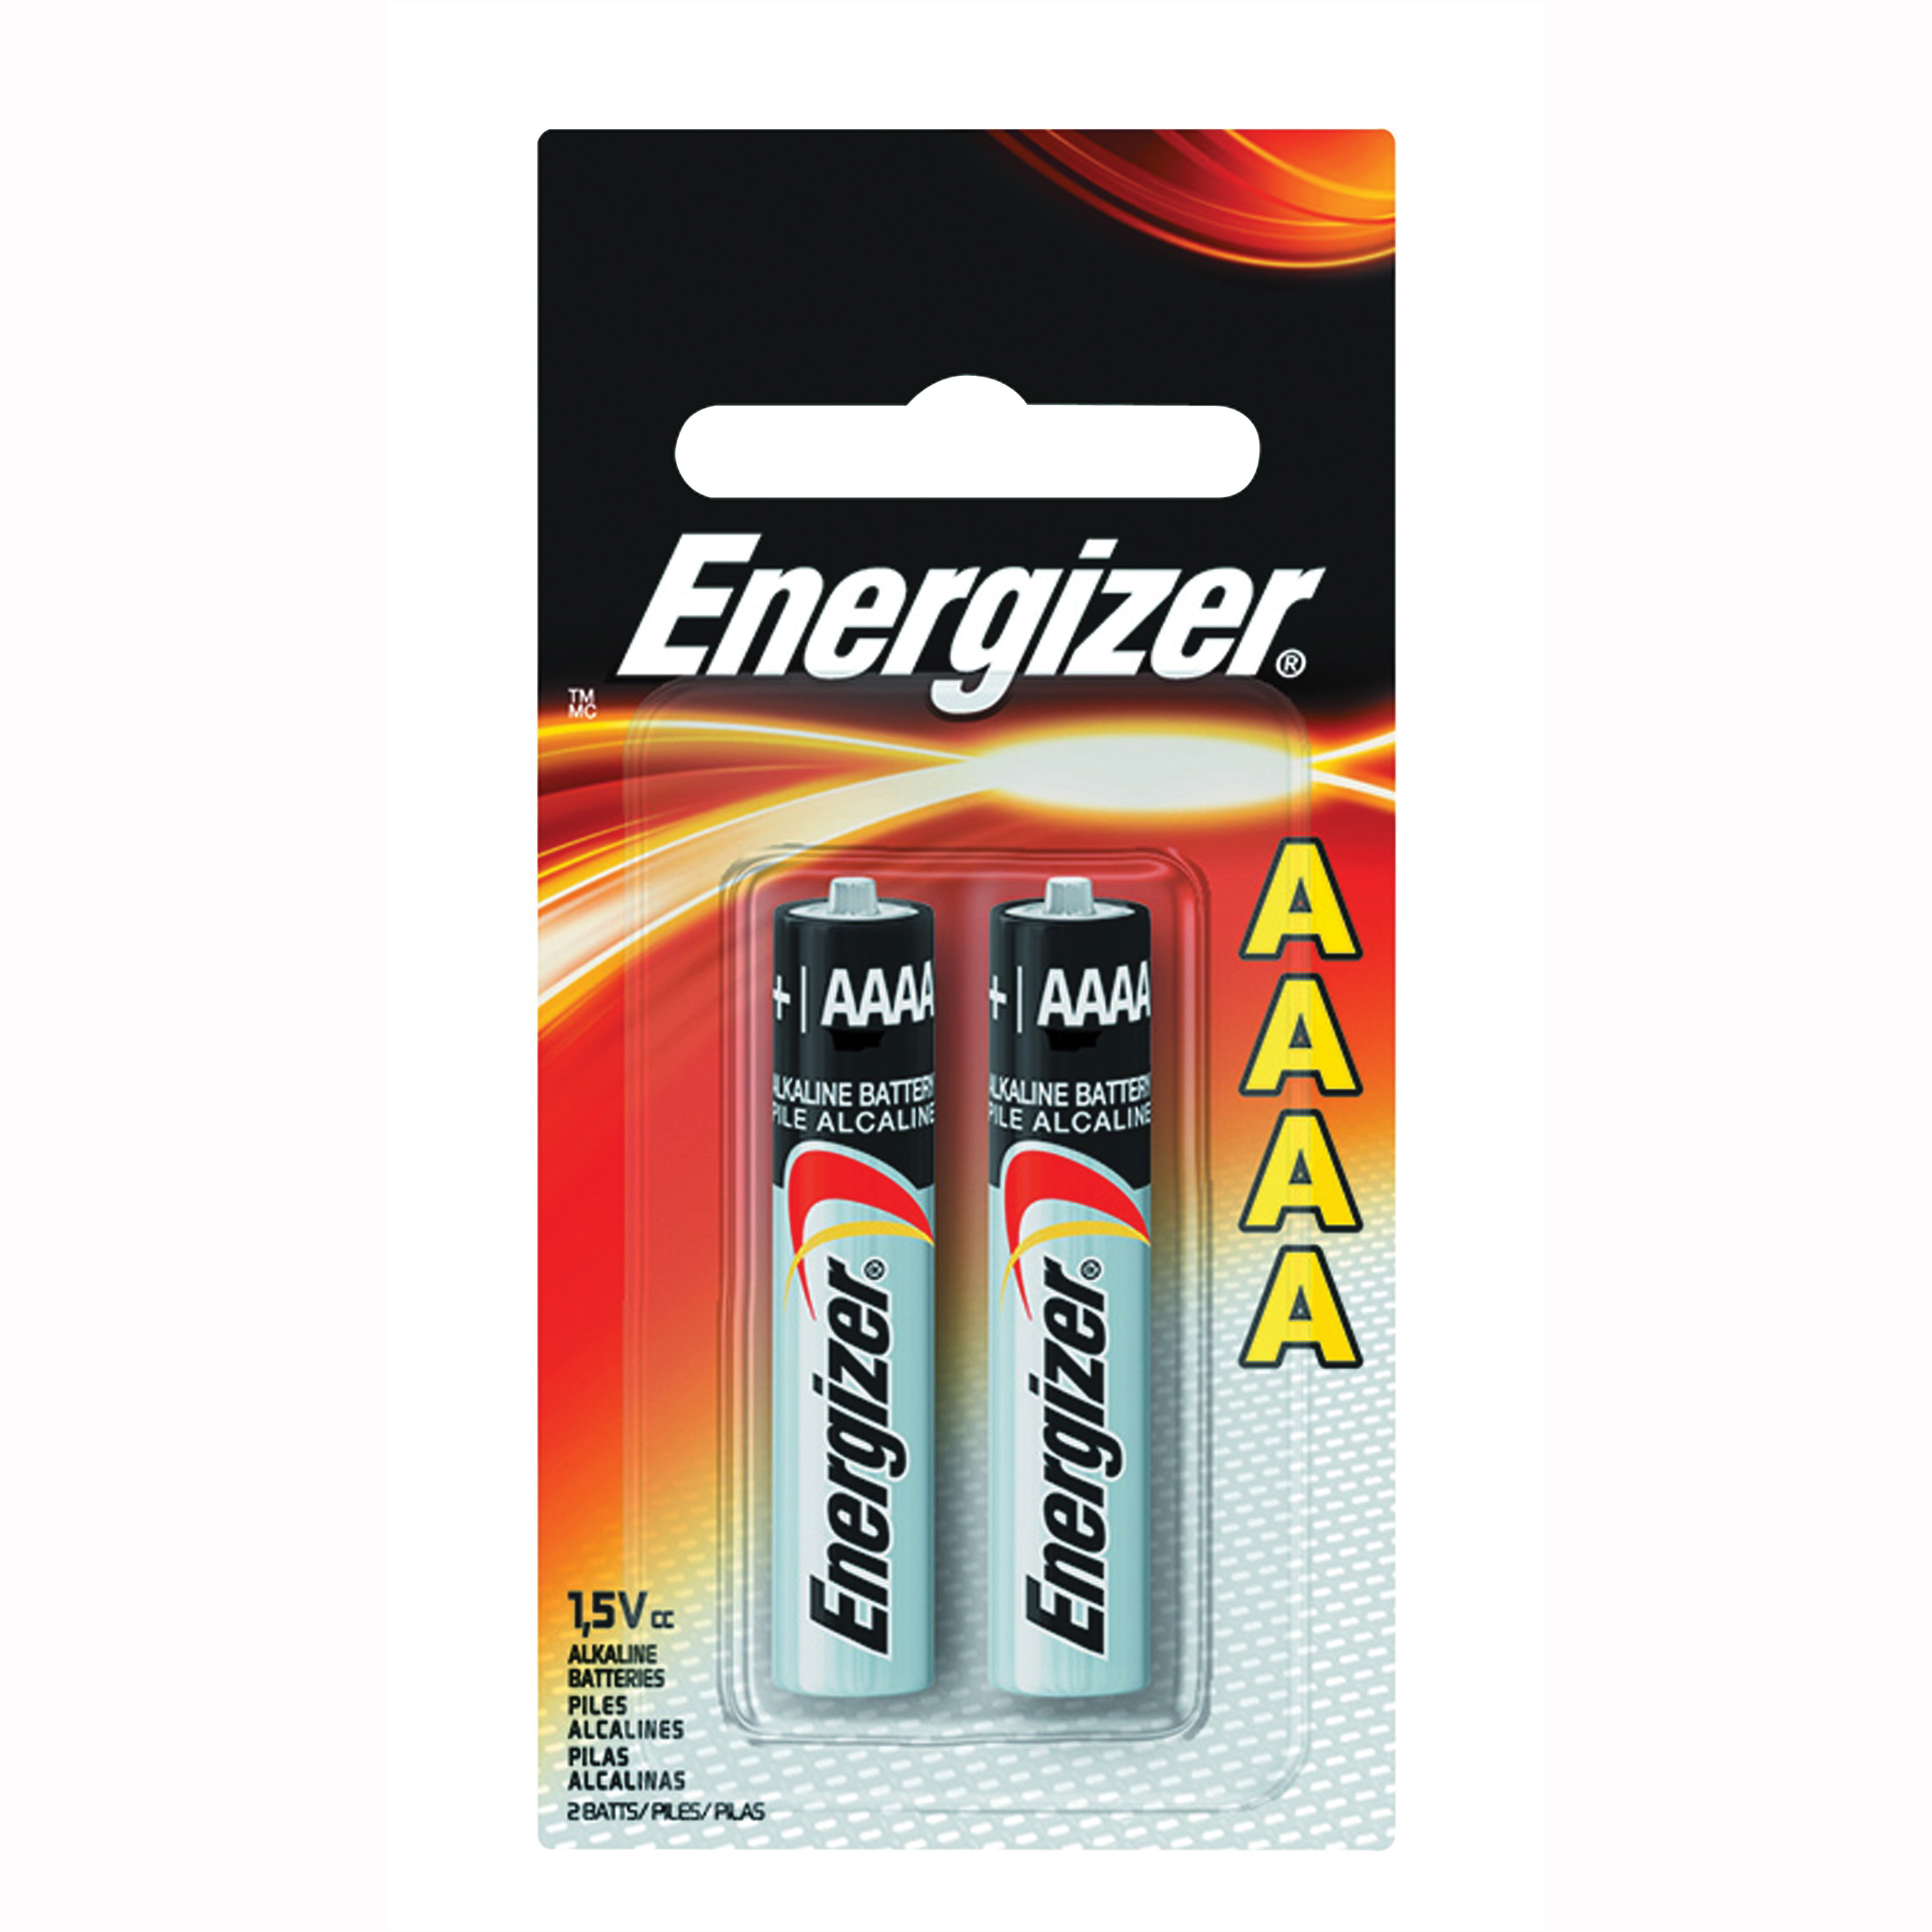 Picture of Energizer E96 Series E96-BP-2 Alkaline Battery, 1.5 V Battery, 150 mAh, AAAA Battery, Zinc, Manganese Dioxide